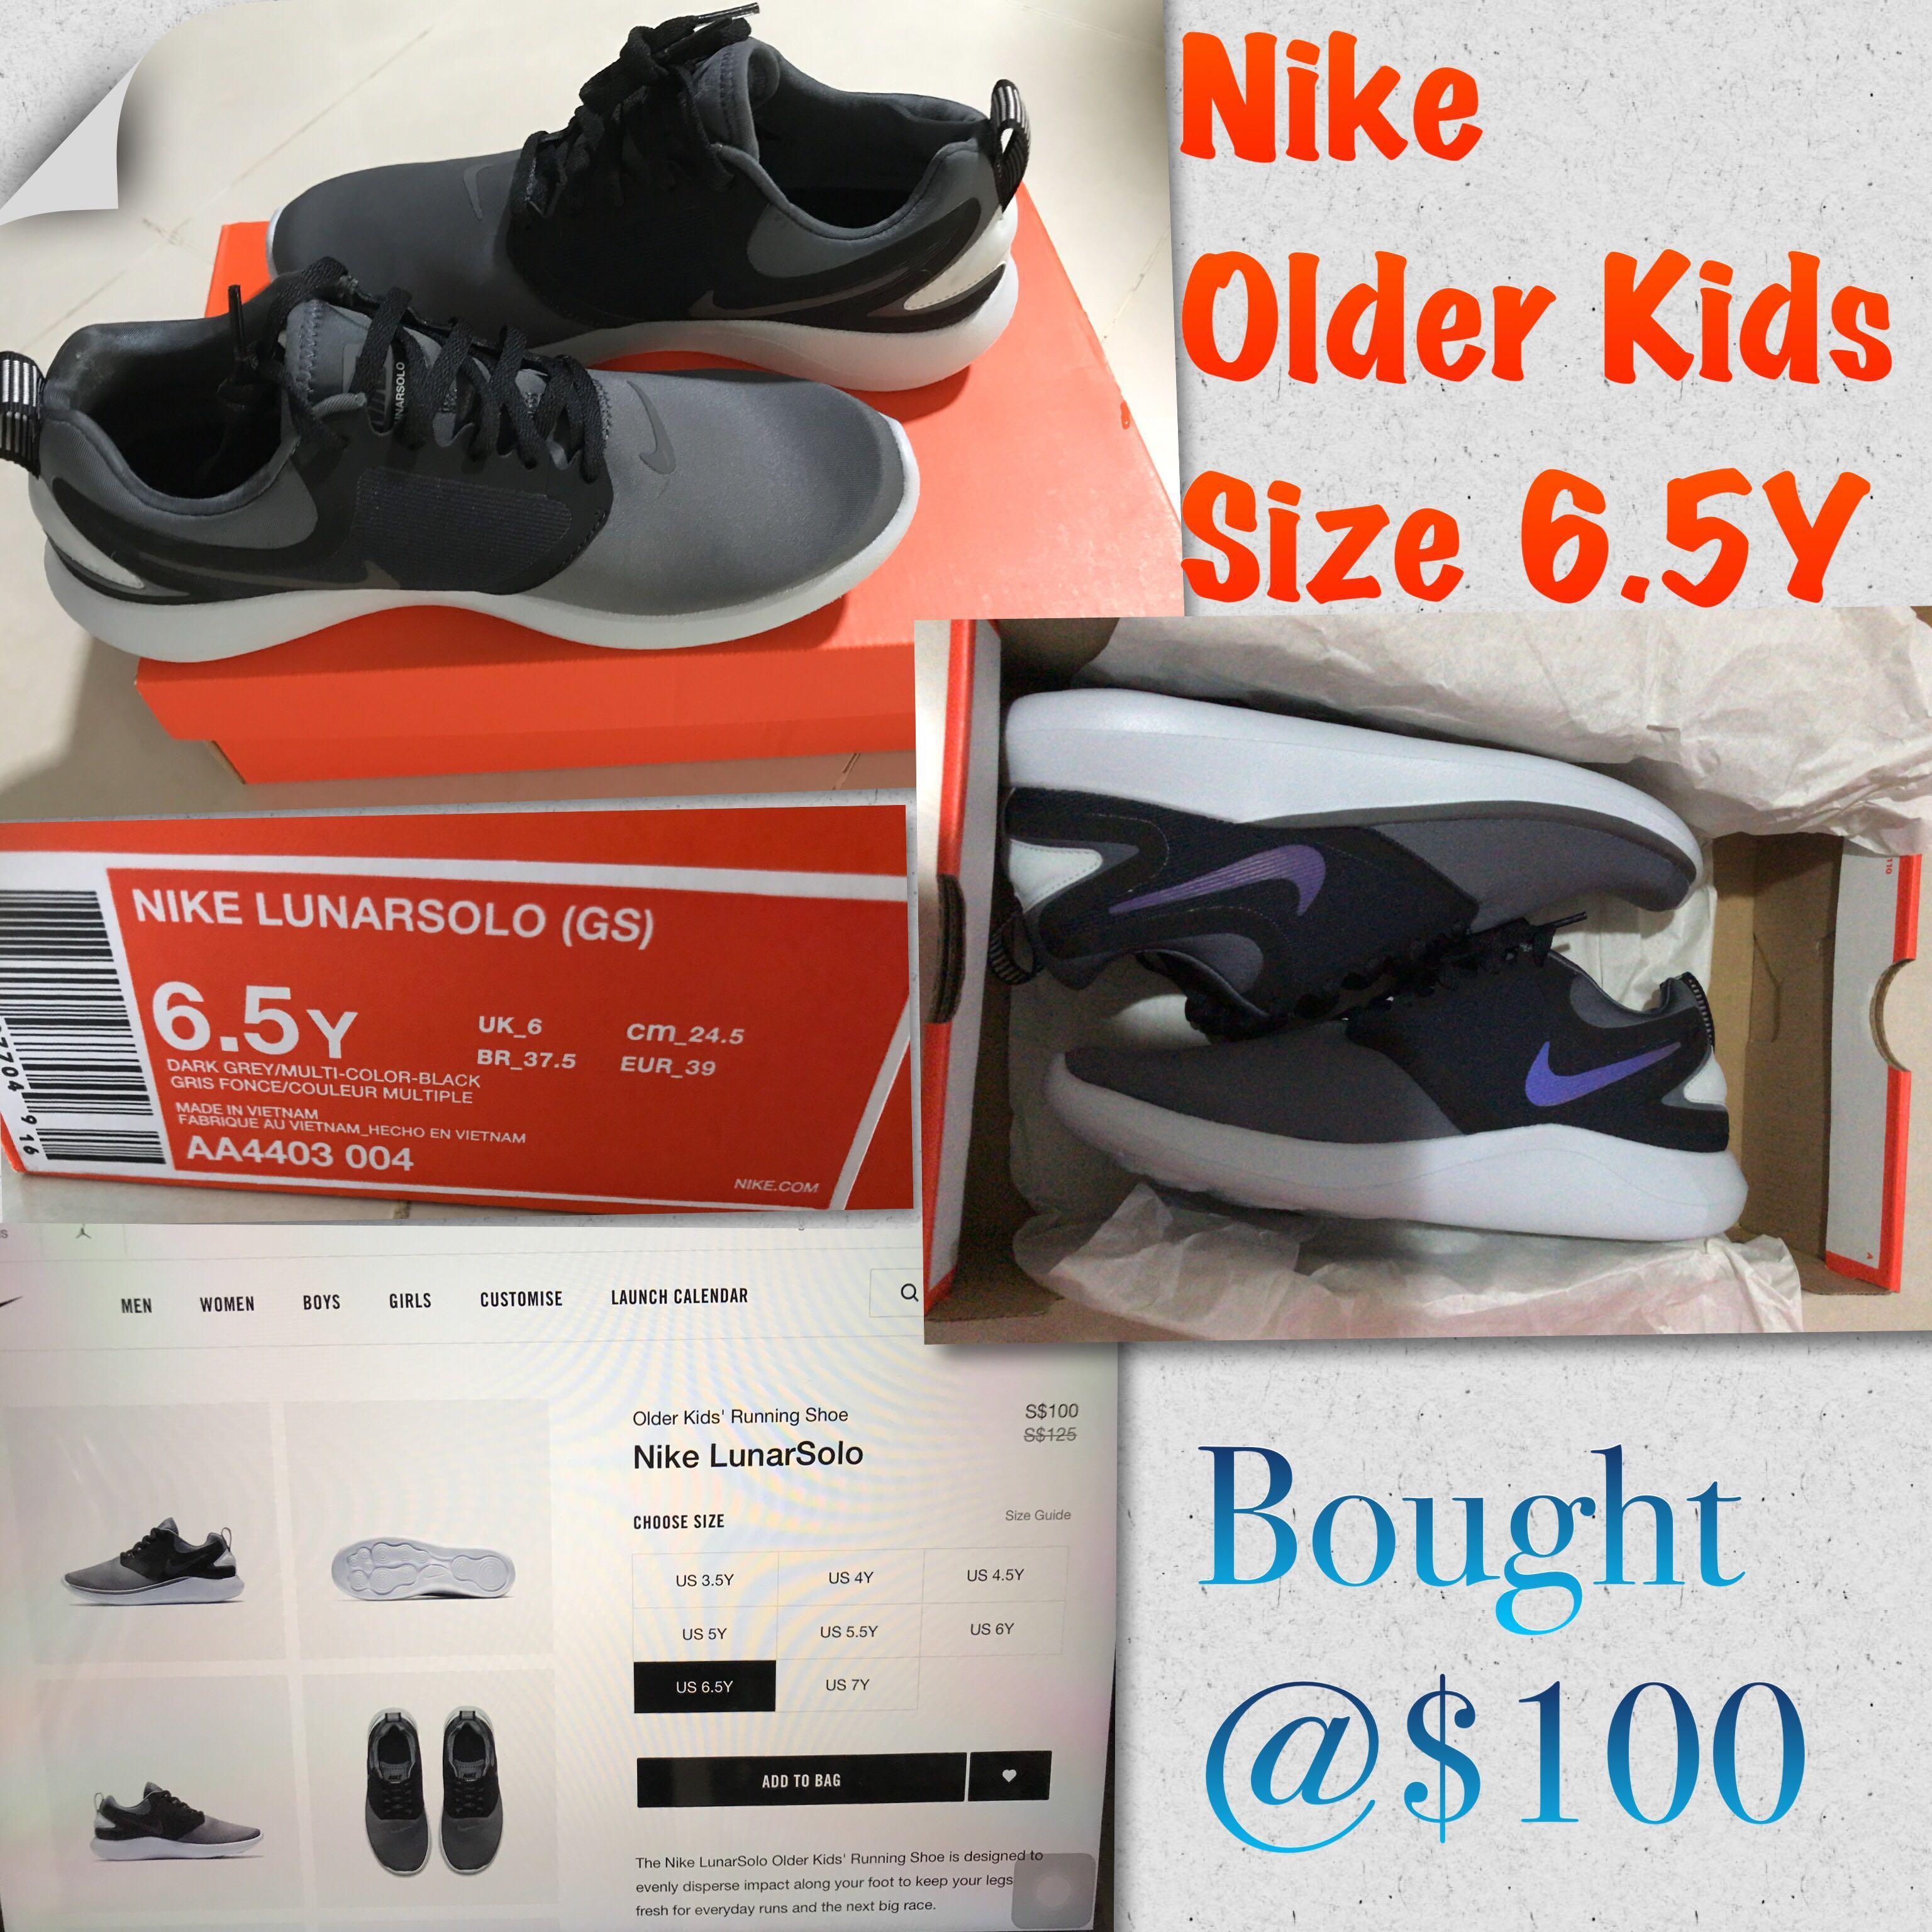 New Nike Older Kids Running Shoes - LunarSolo f1c48f100